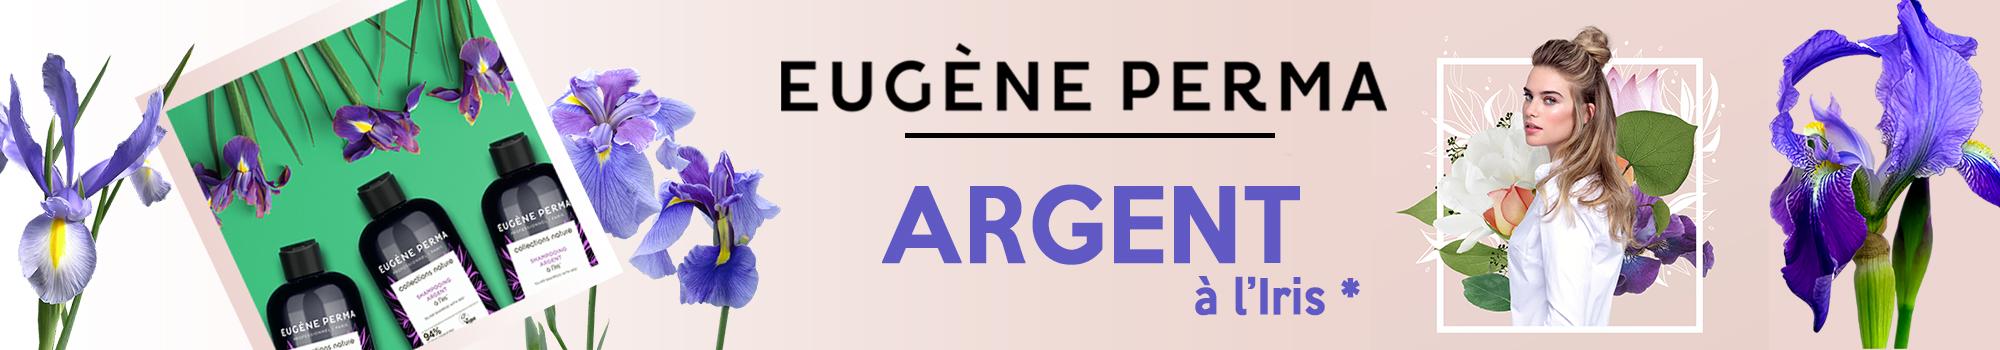 Collections Nature Argent Eugène Perma